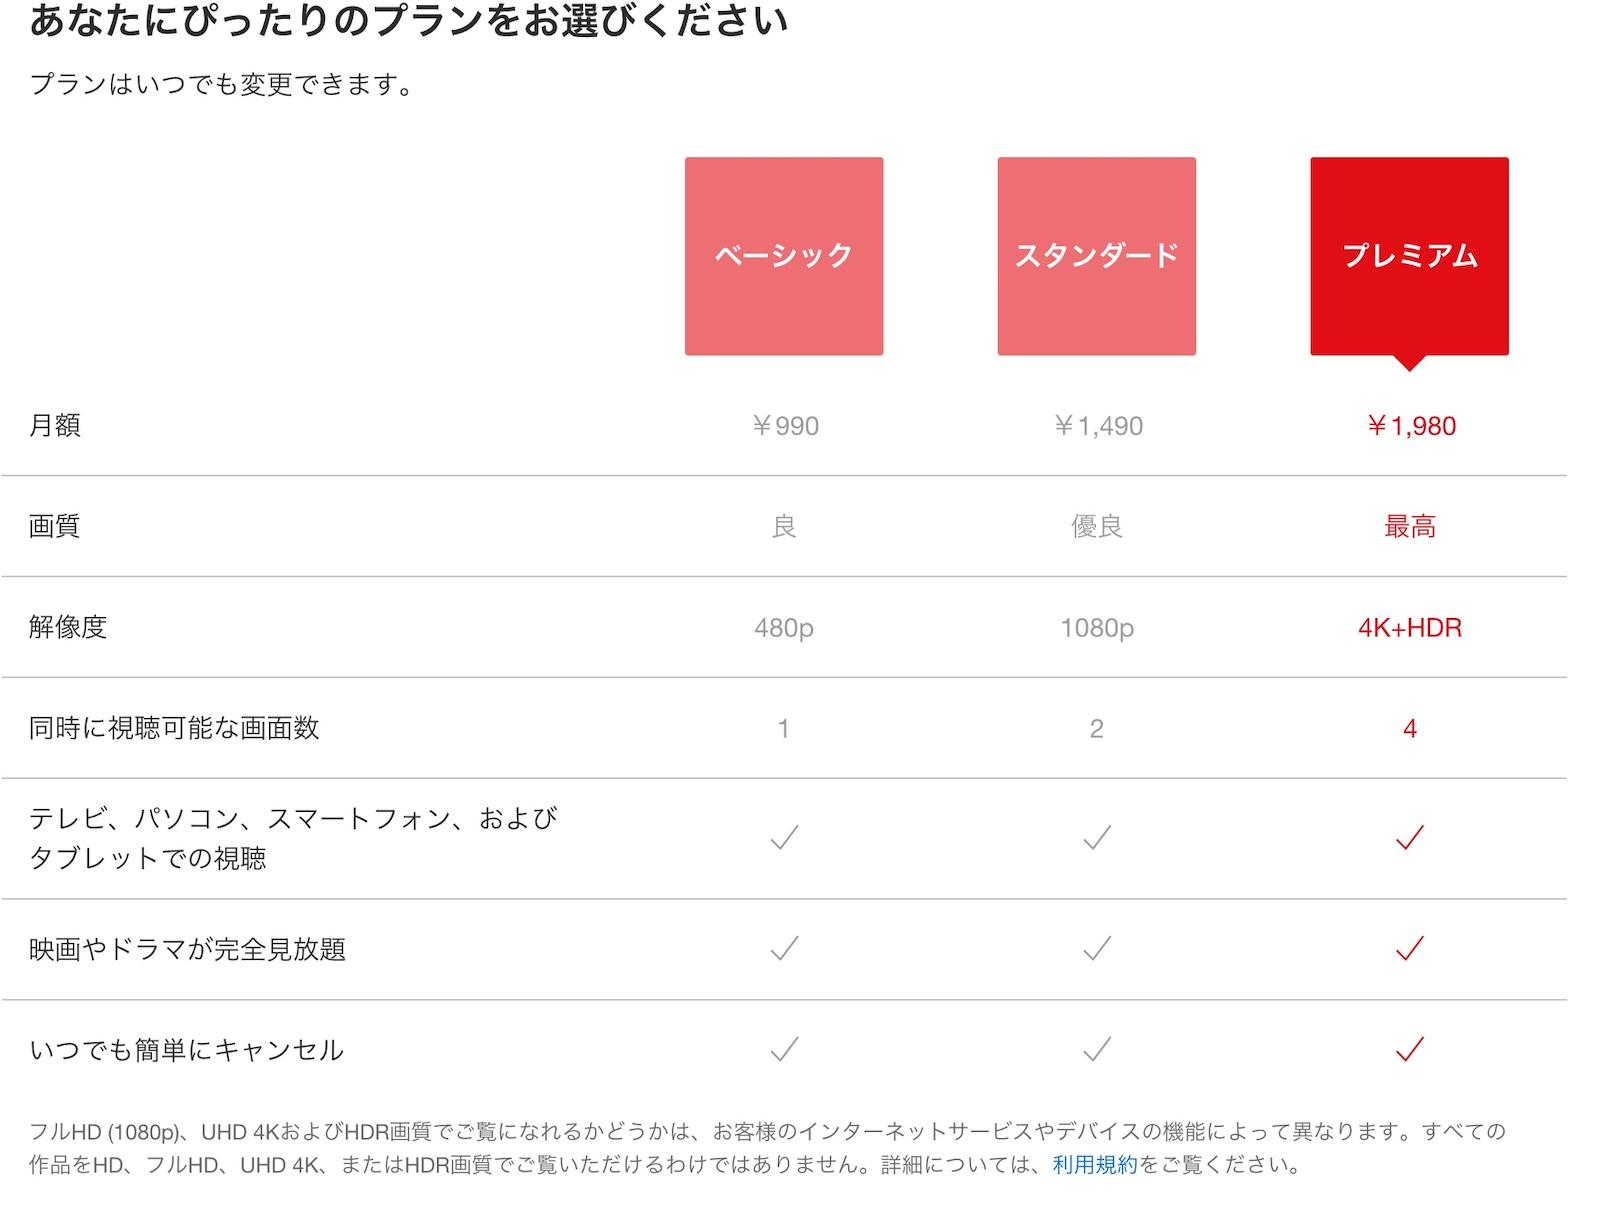 Netflix plans in japan